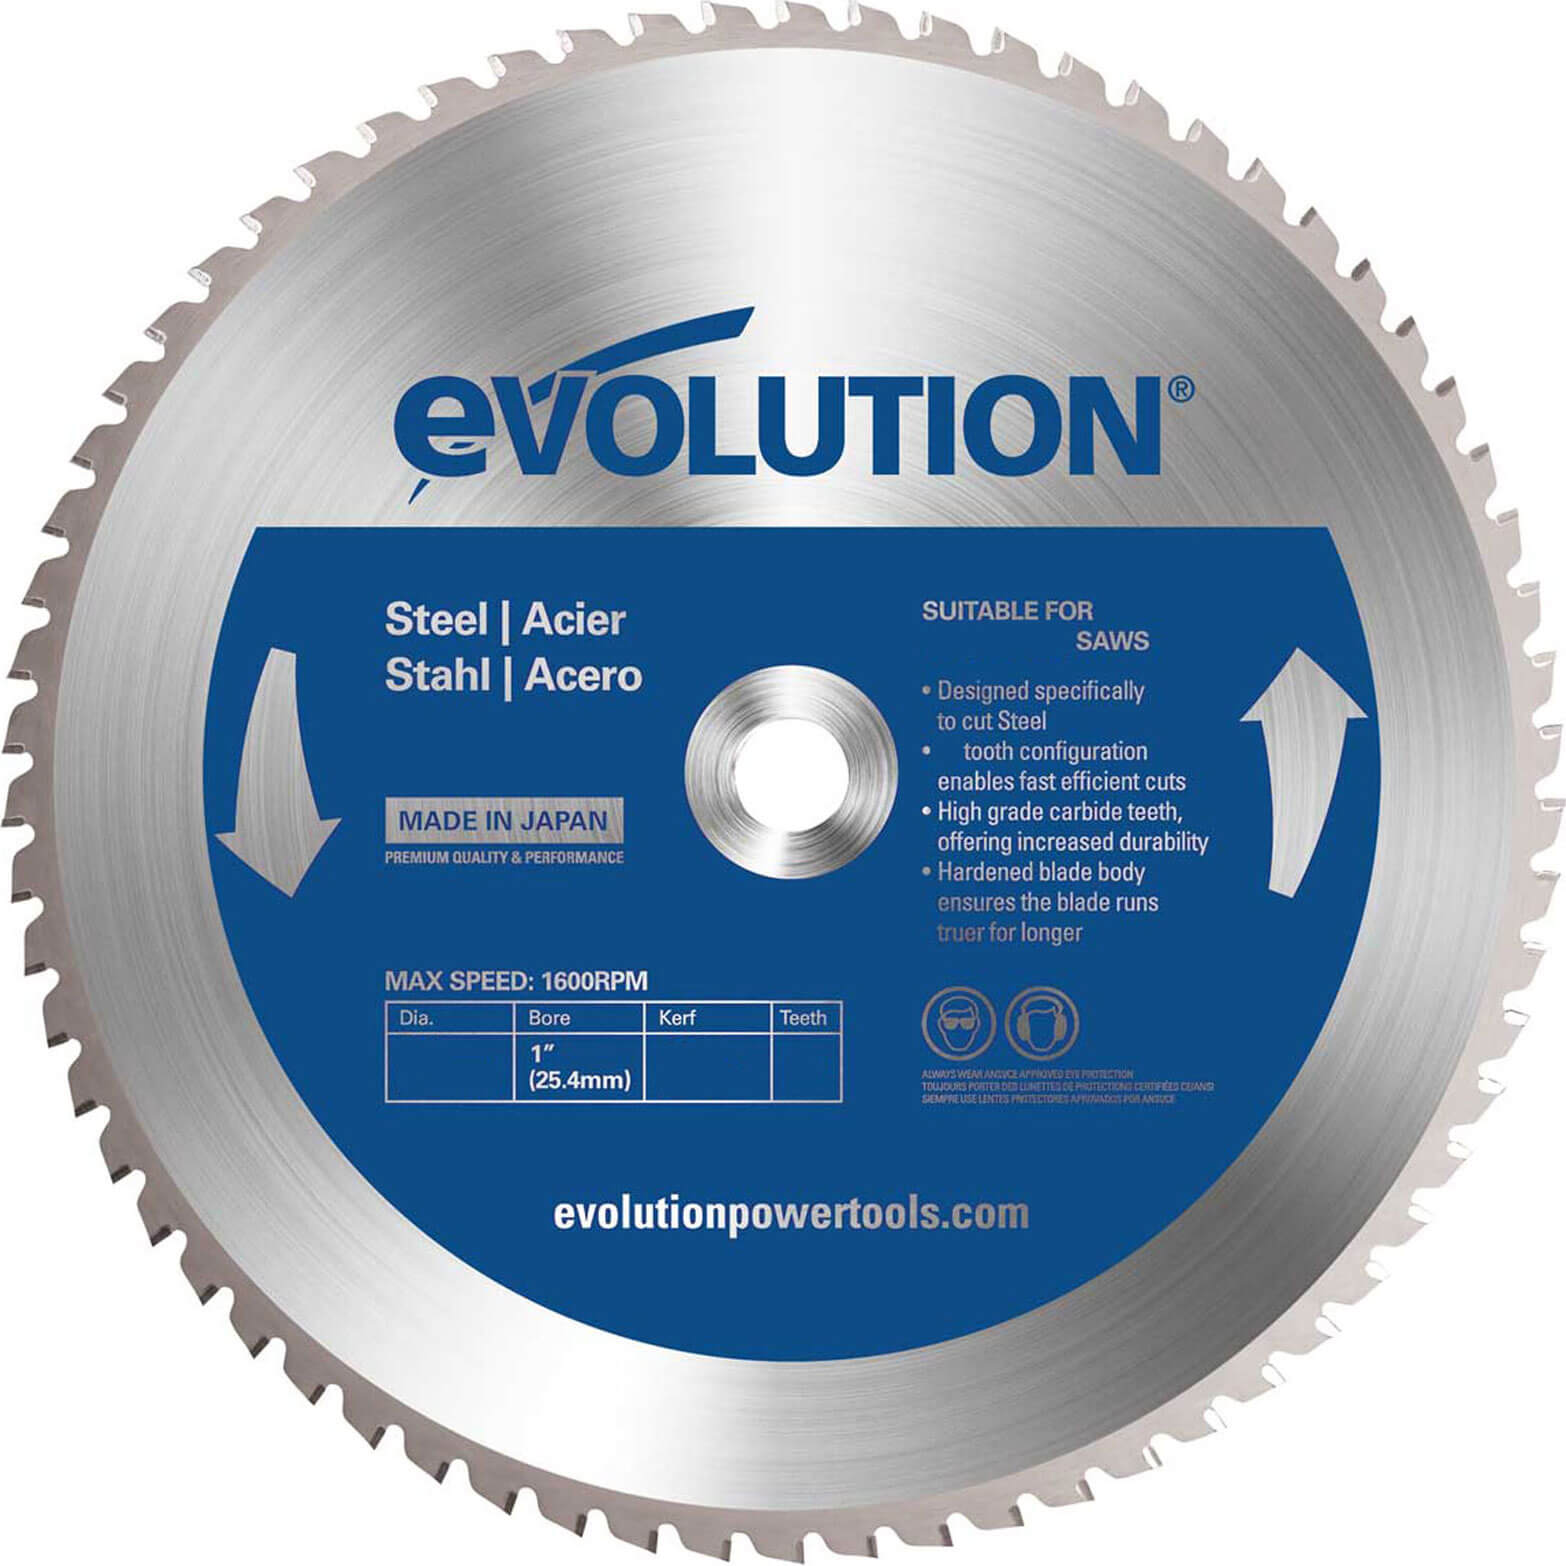 Image of Evolution Mild Steel Cutting Saw Blade 305mm 60T 25.4mm